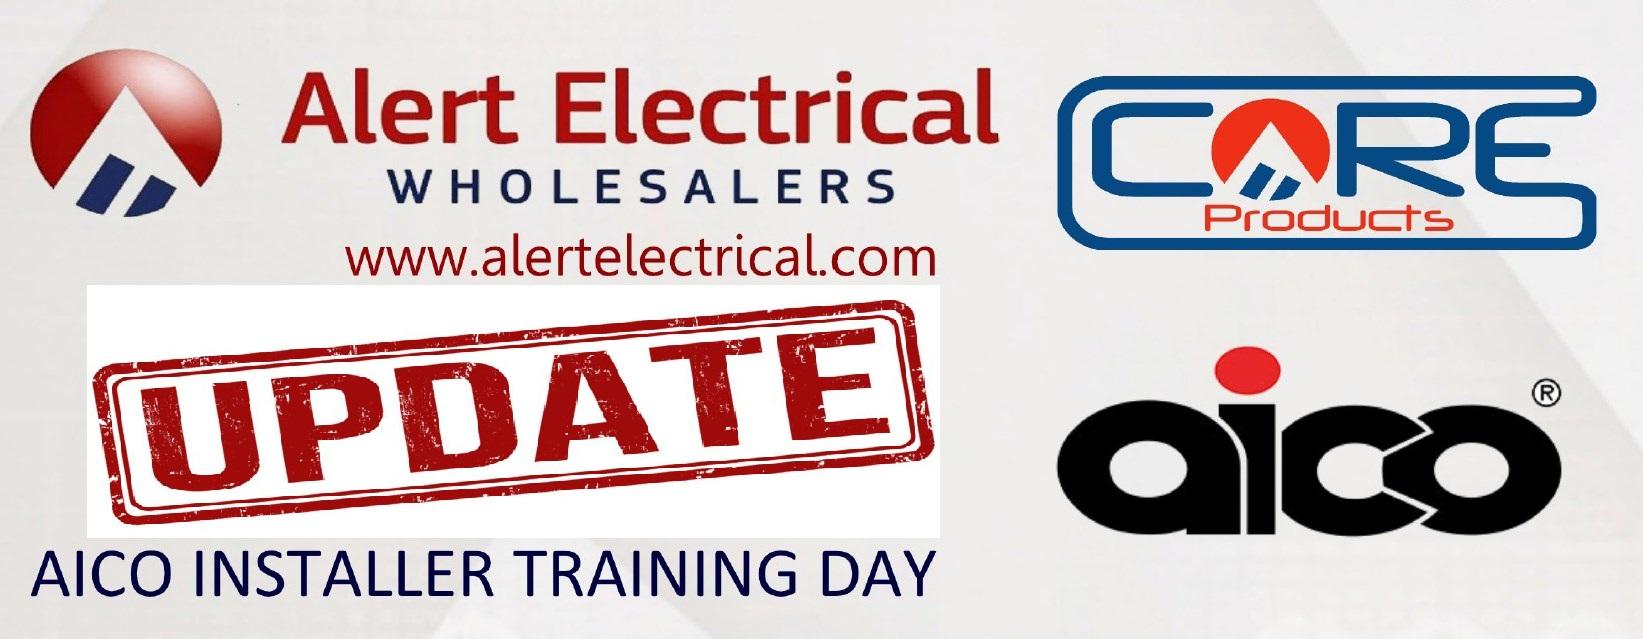 Aico Installer Training Day Update